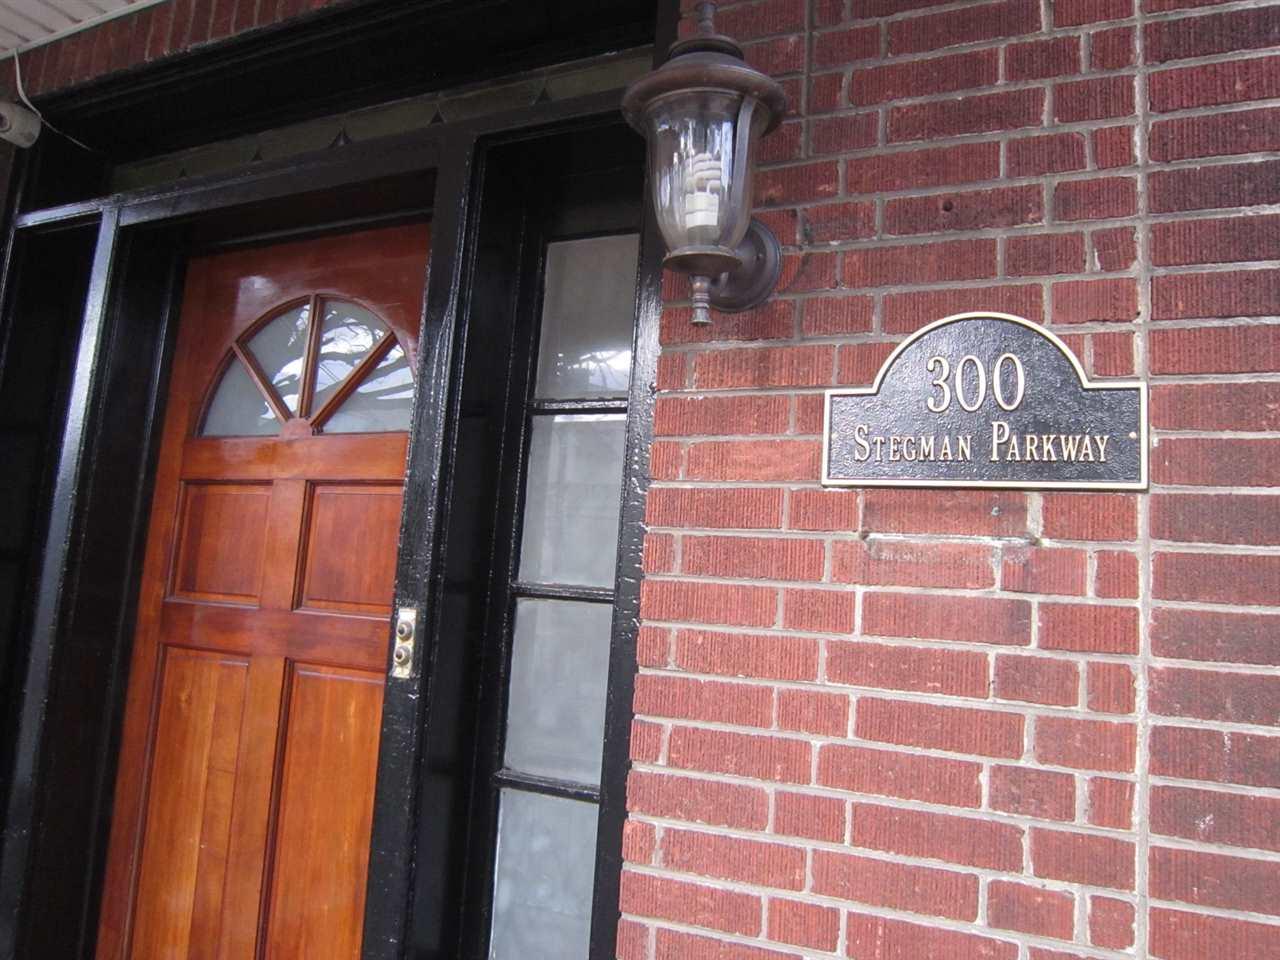 300 STEGMAN PARKWAY 1, JC, West Bergen, NJ 07305